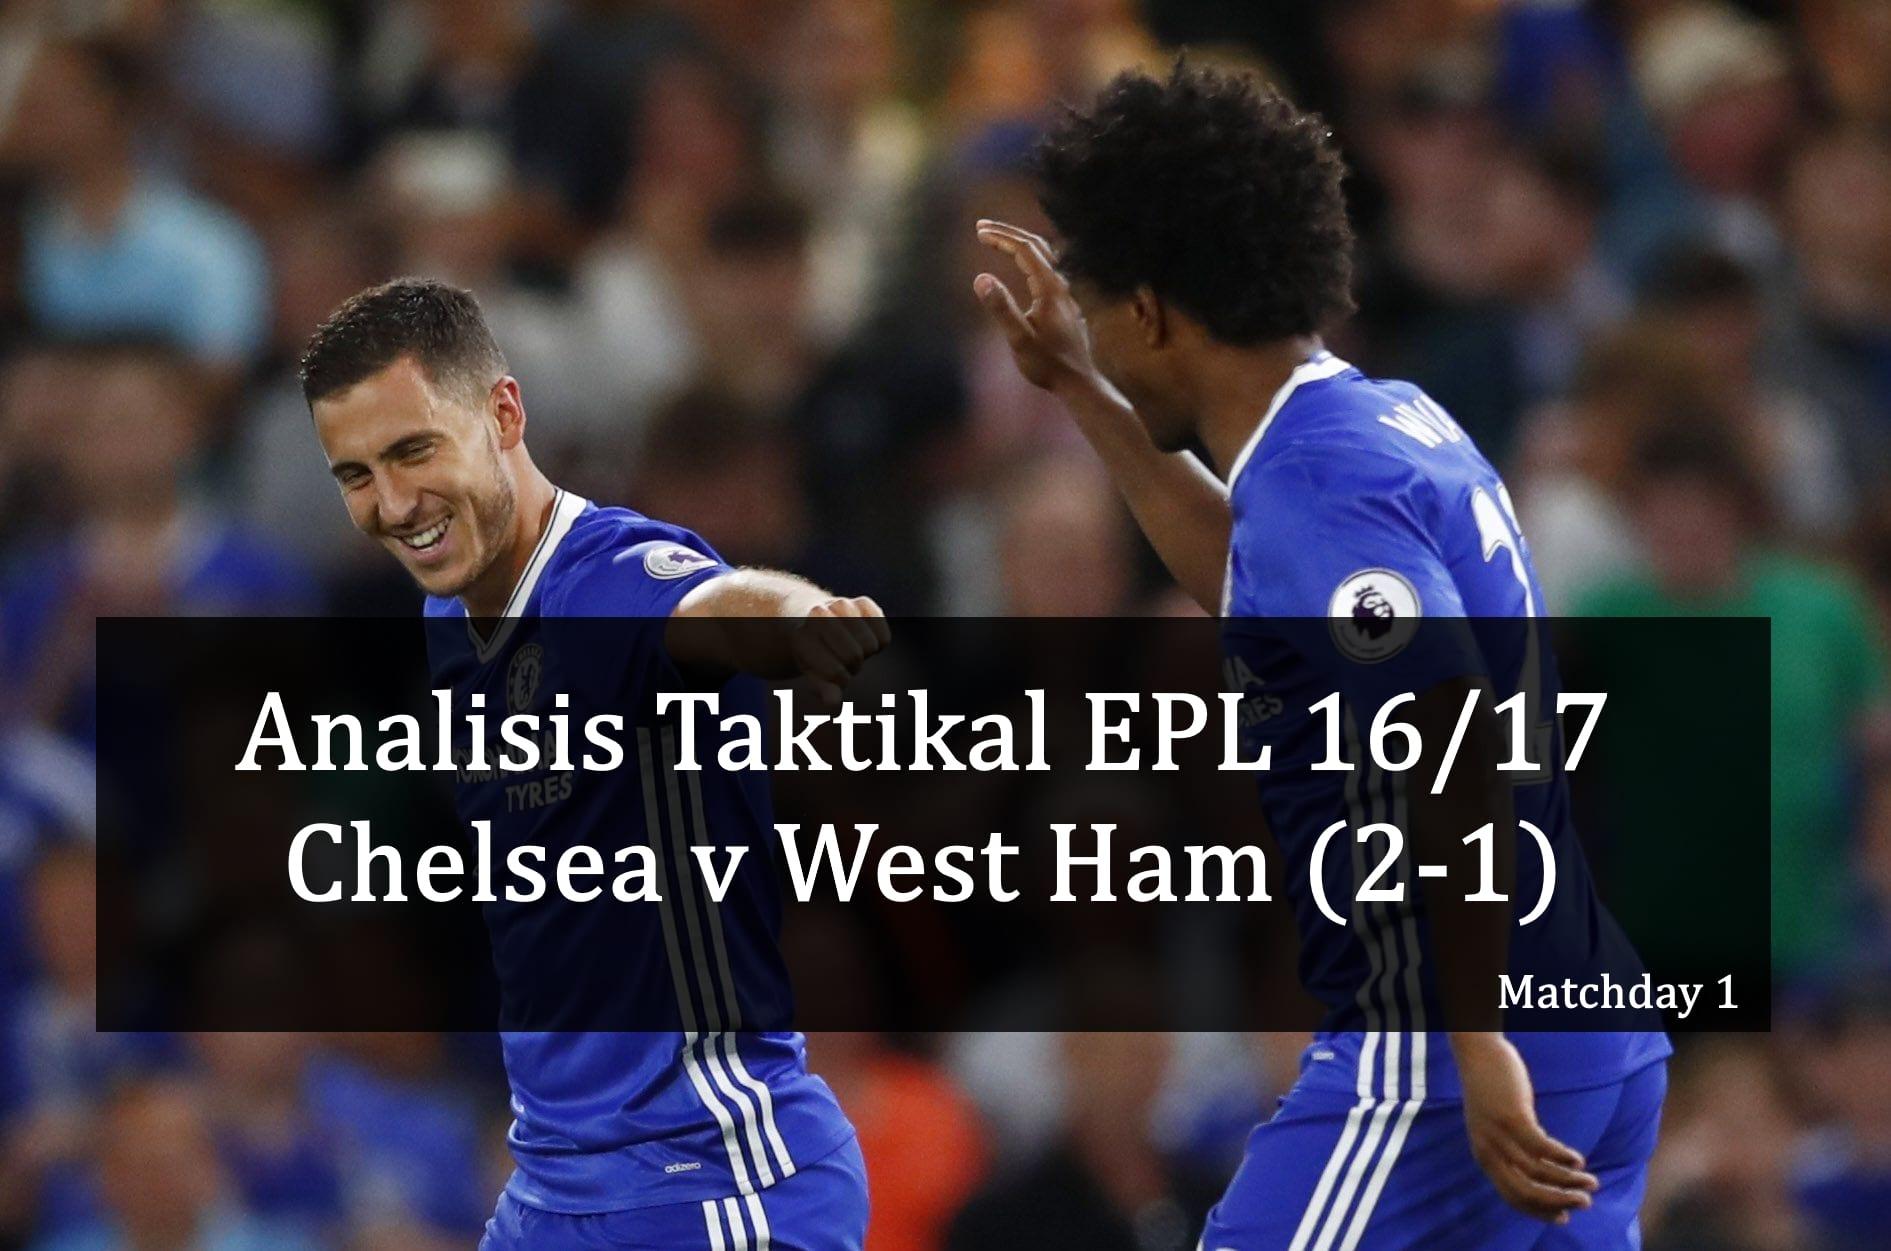 Analisis Taktikal EPL 16/17: Chelsea v West Ham (2-1) Perubahan Taktikal Kepada  ...